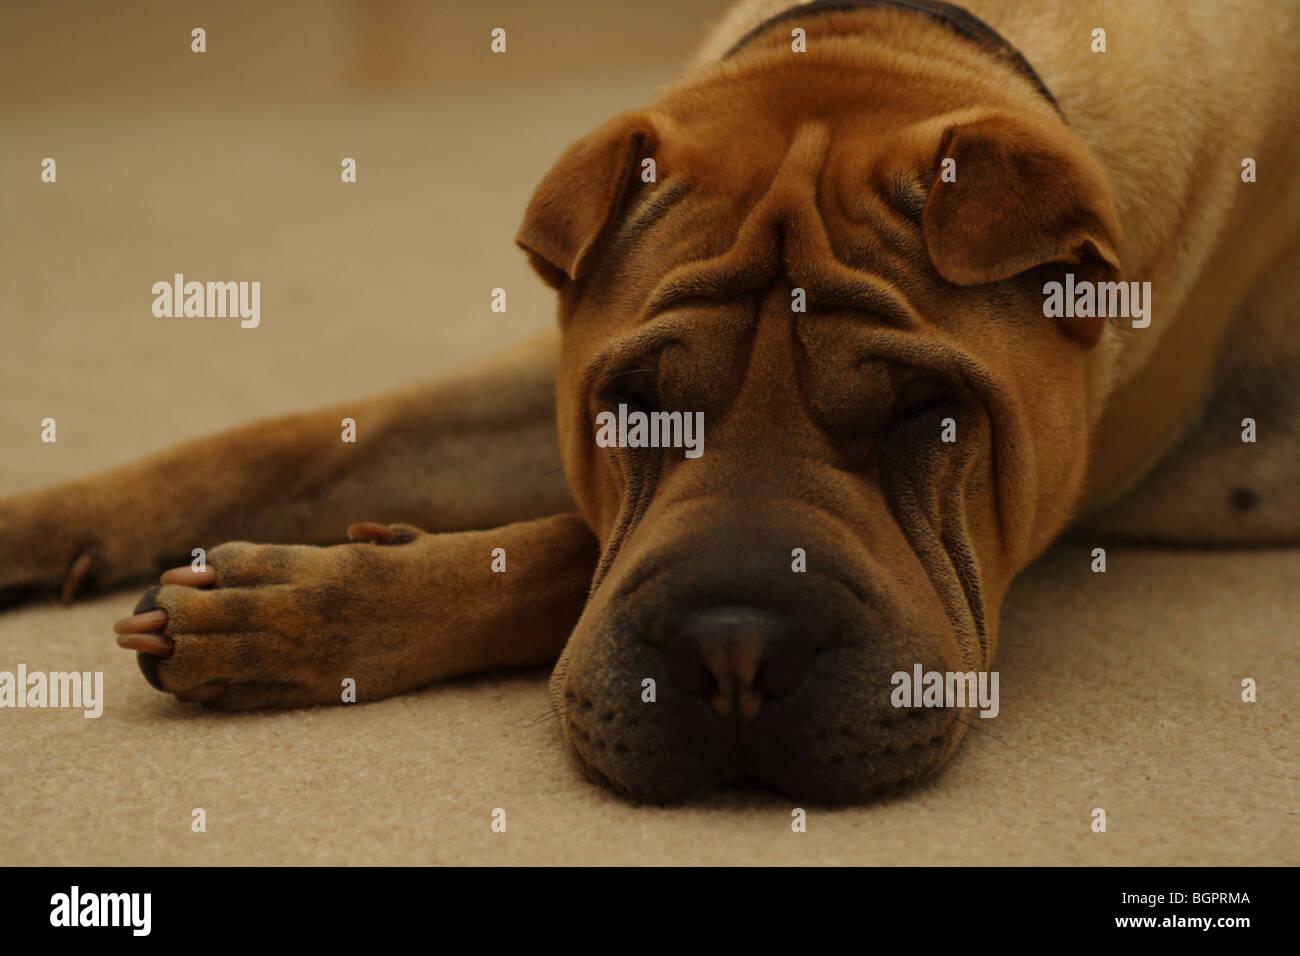 Shar Pei puppy asleep on carpet - Stock Image